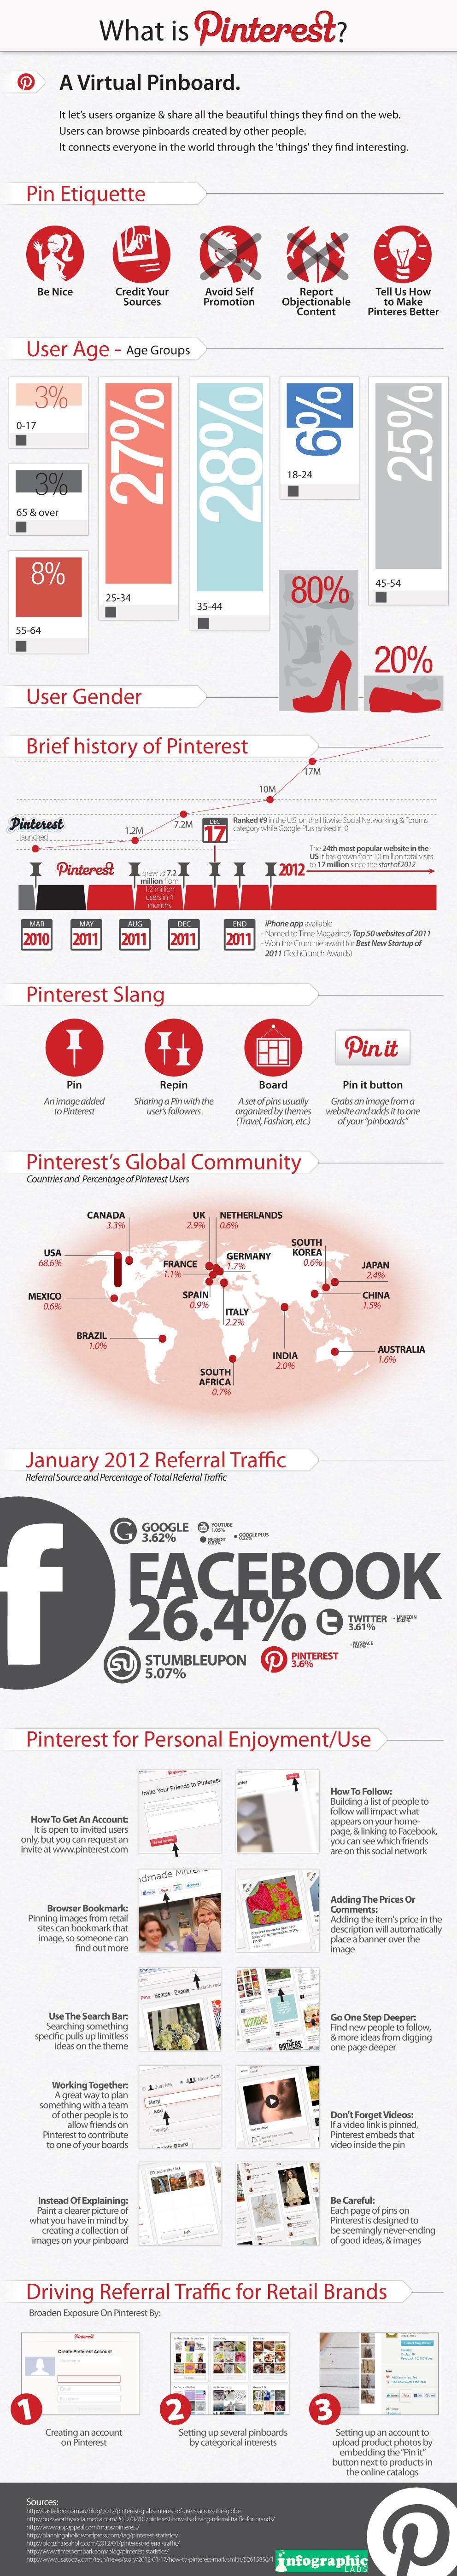 Pinterest-2012-infograpic